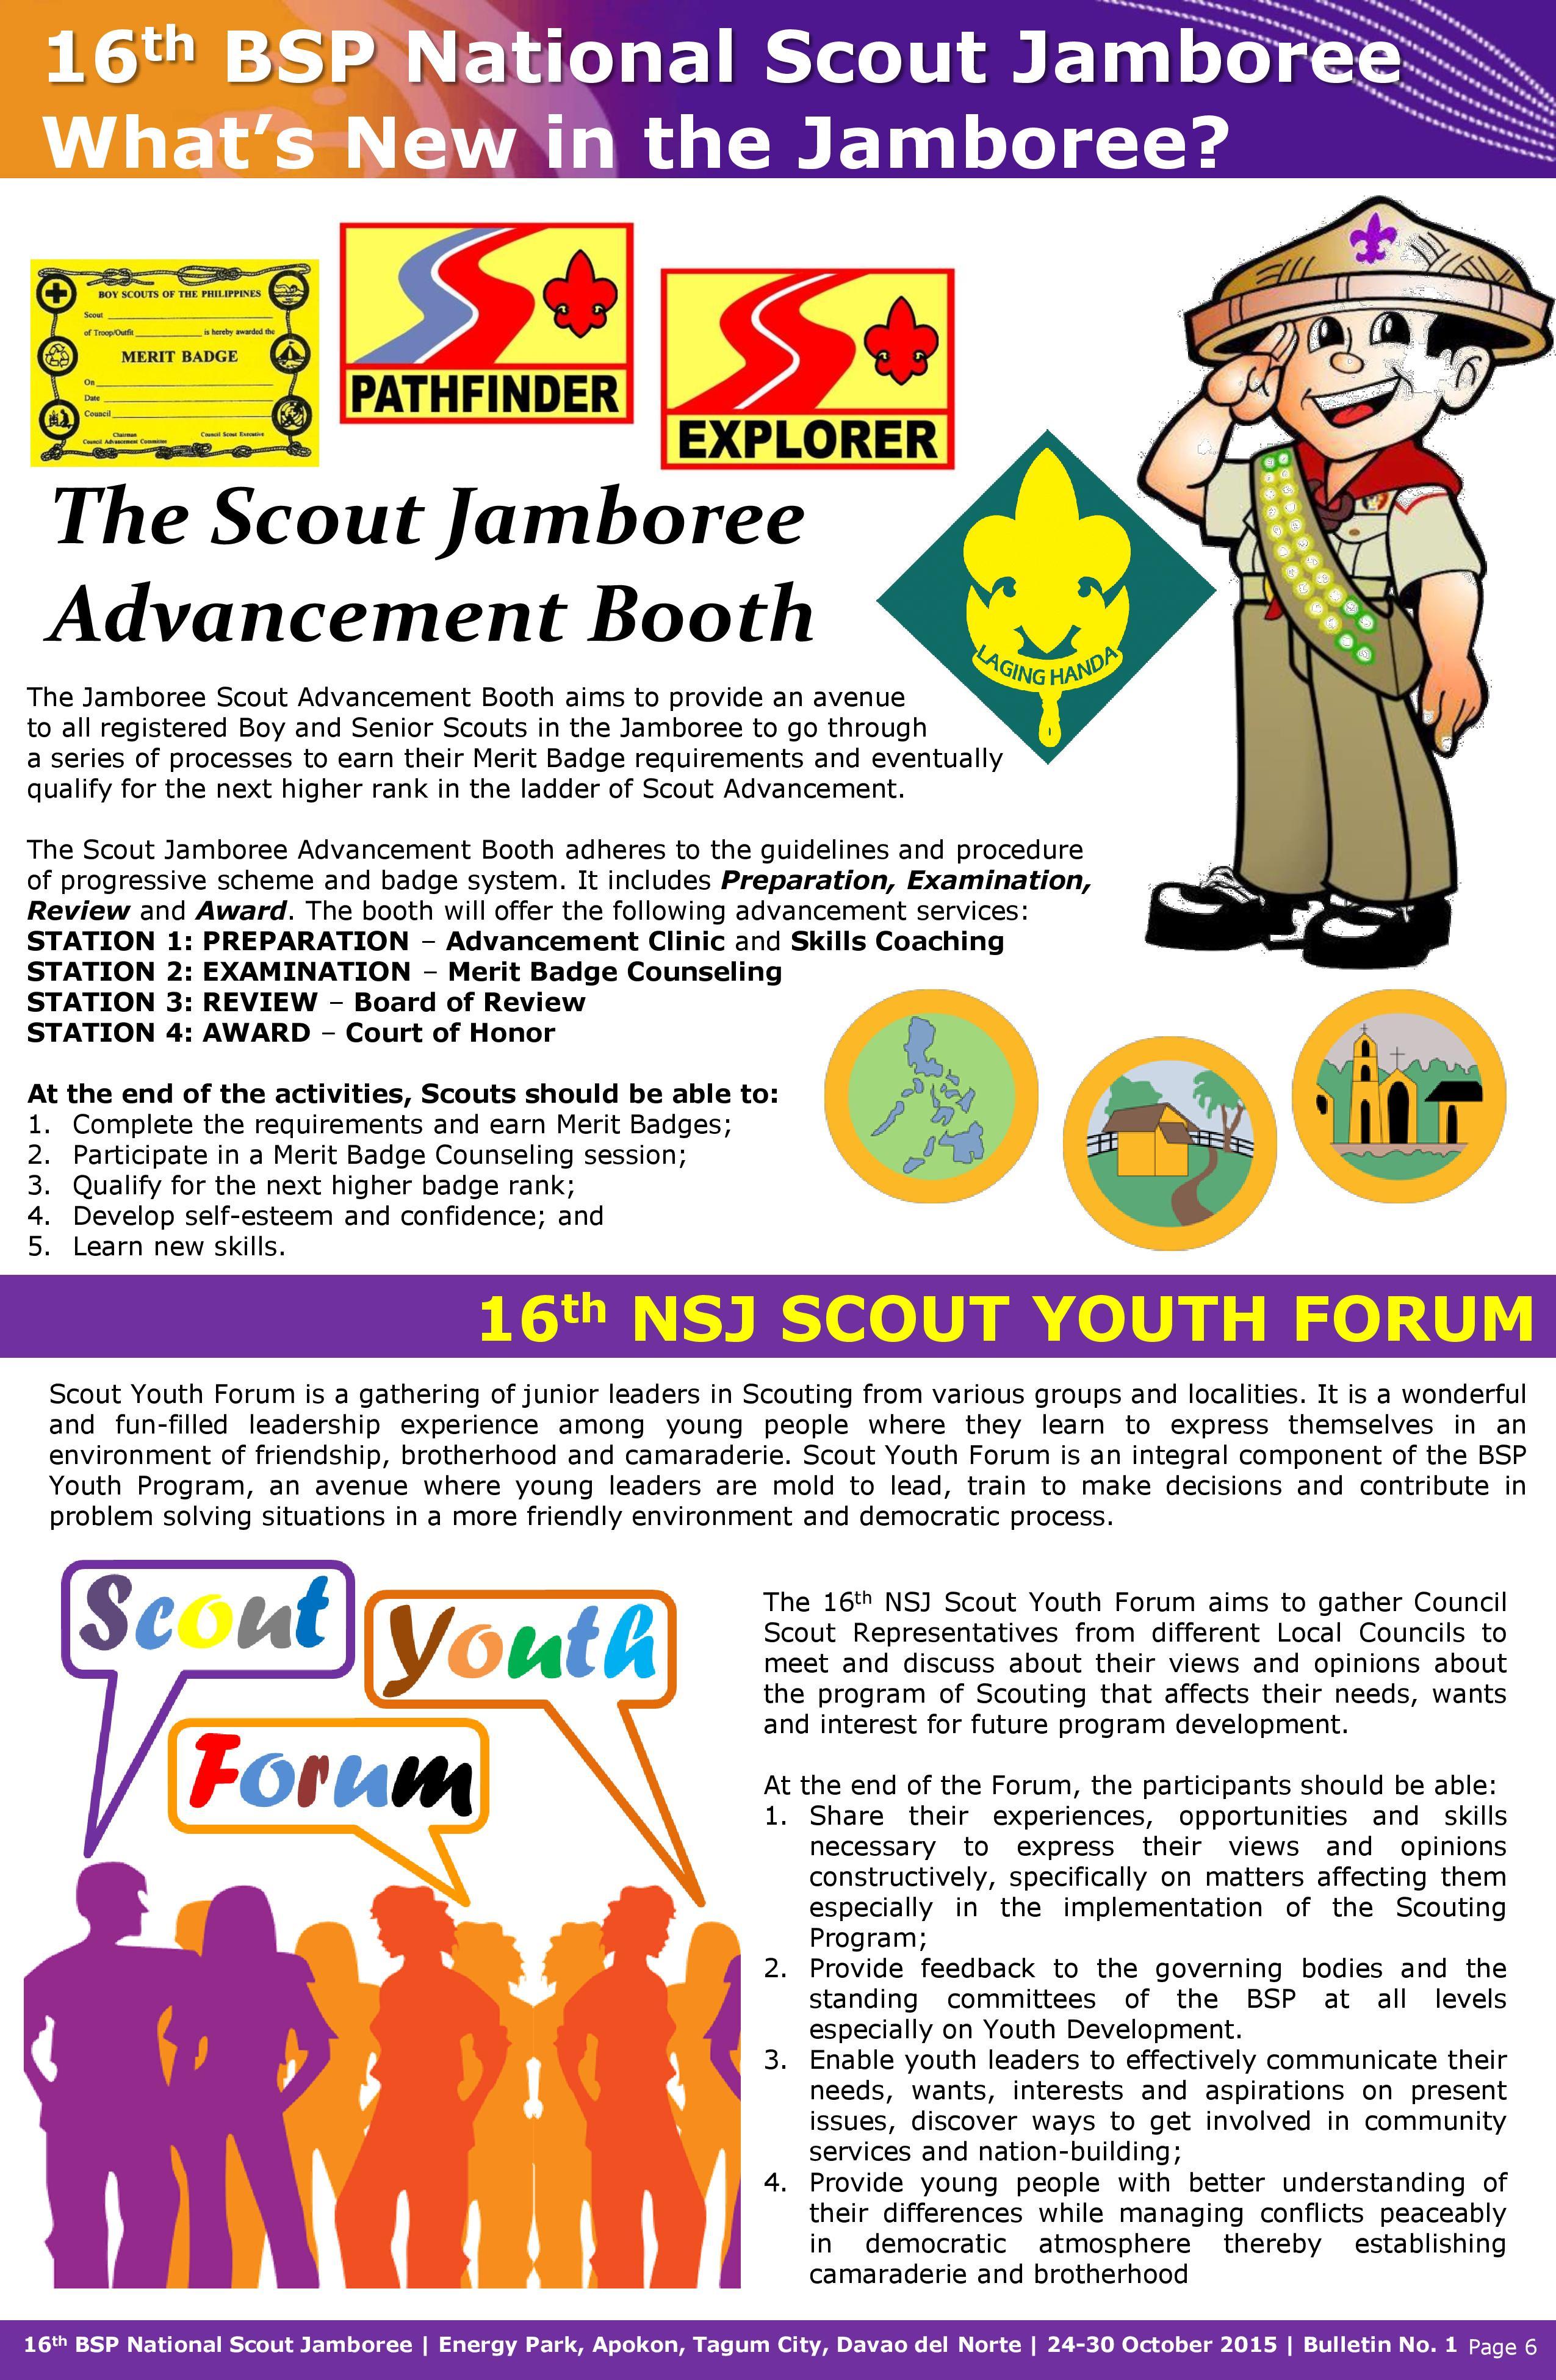 16th National Scout Jamboree